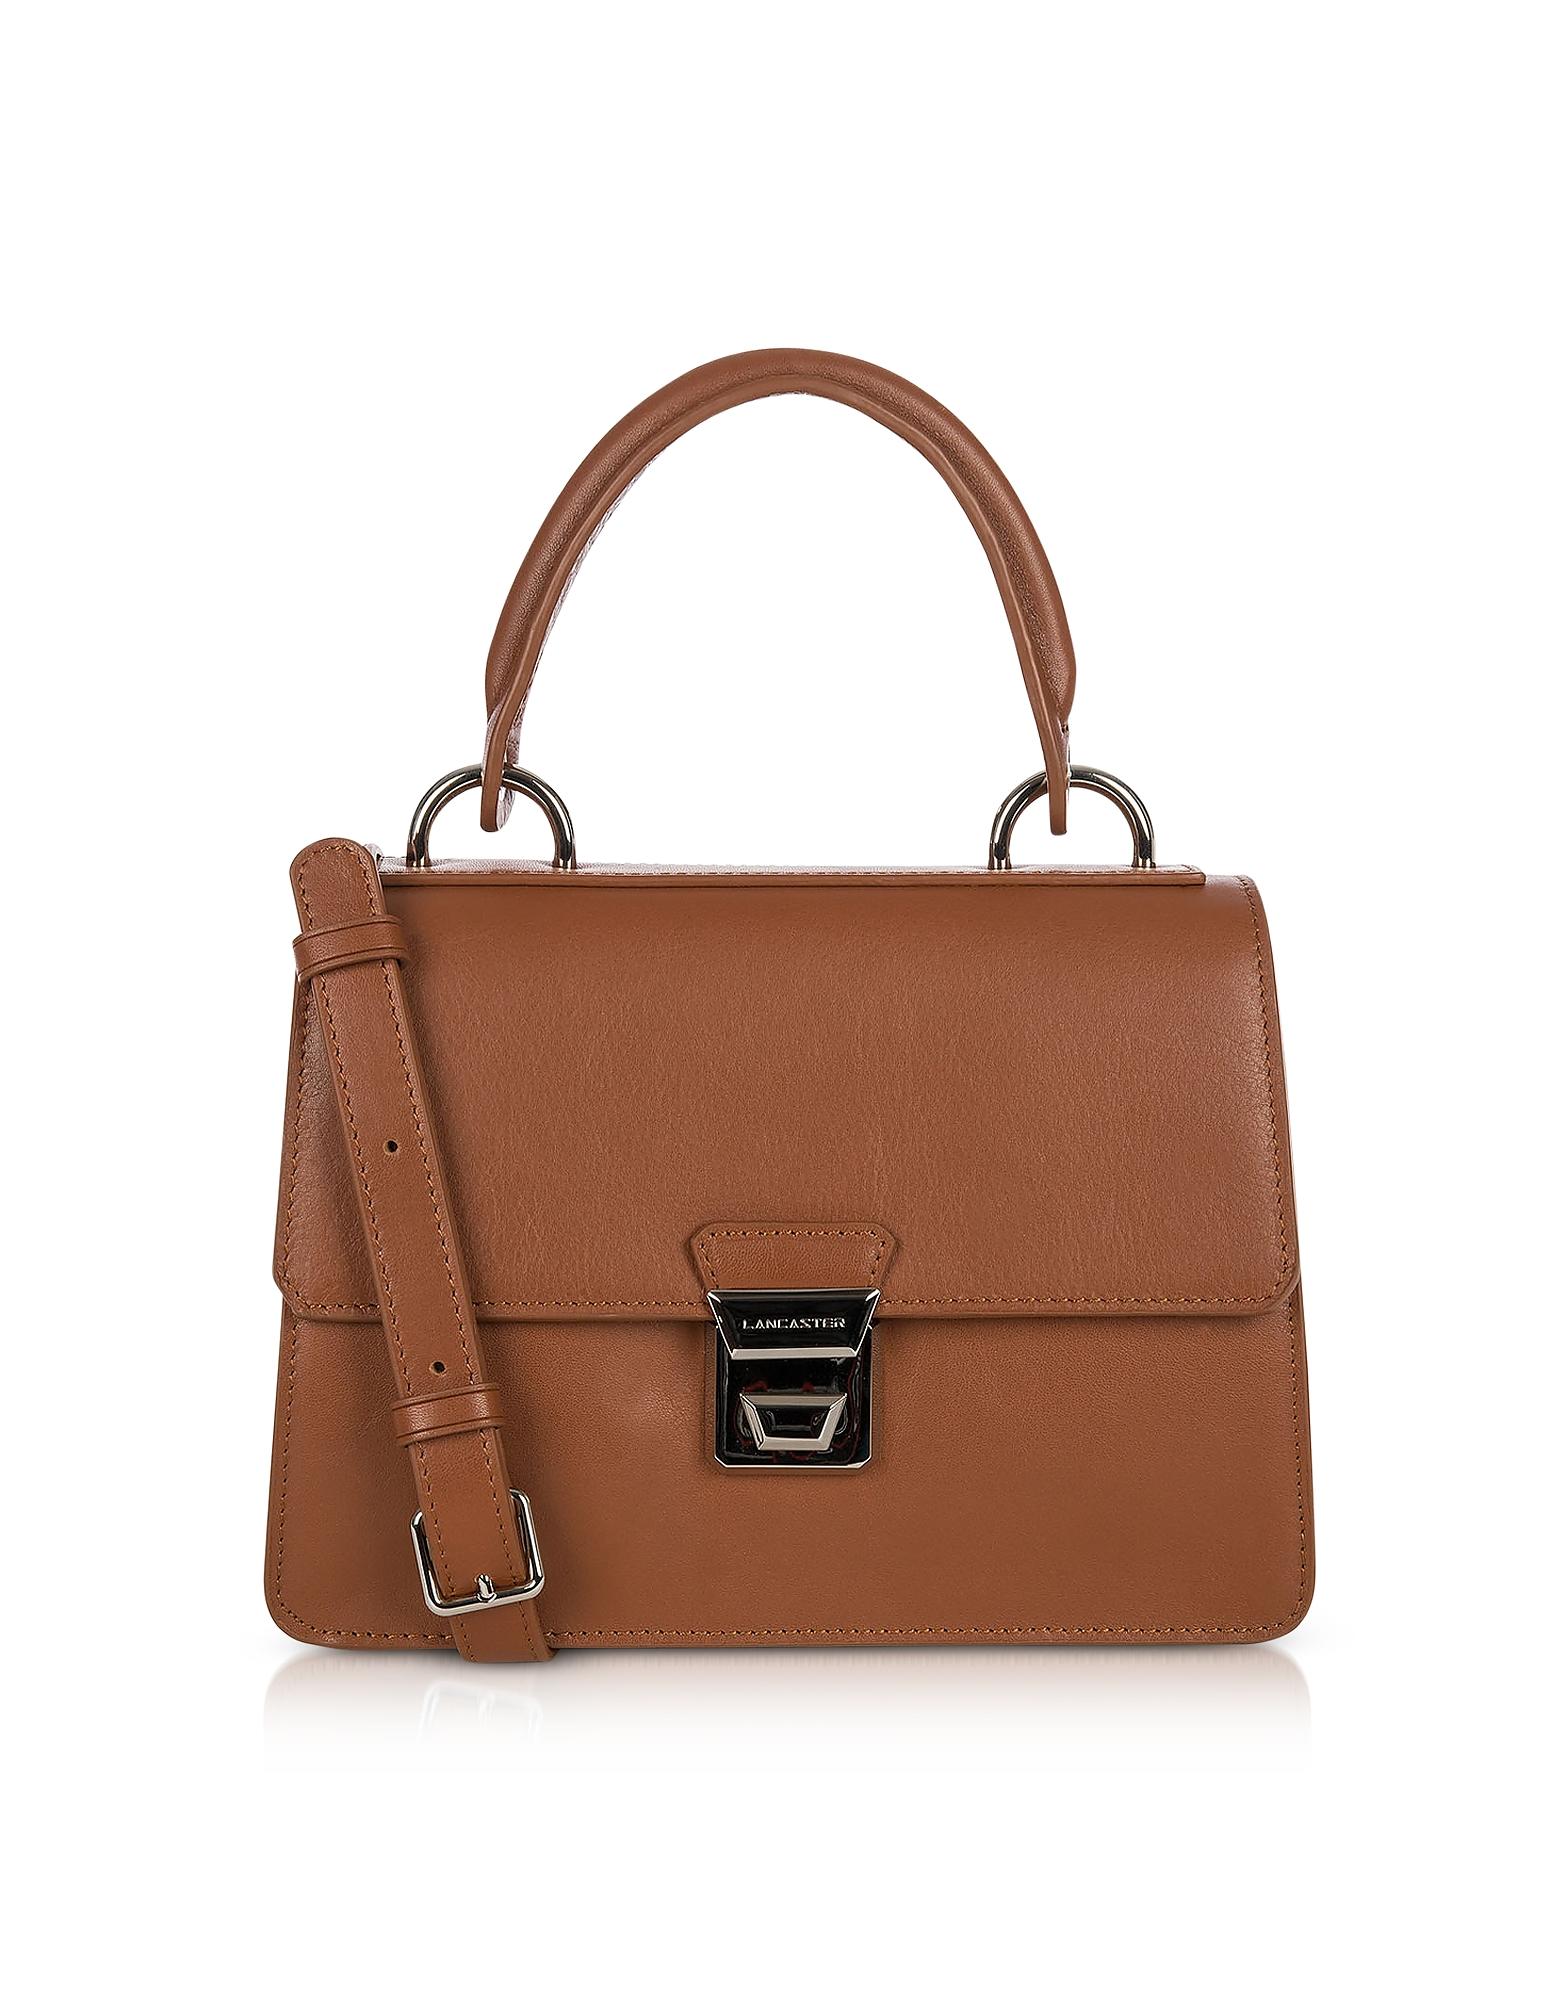 Lancaster Paris Handbags, Garance Leather Top Handle Shoulder Bag